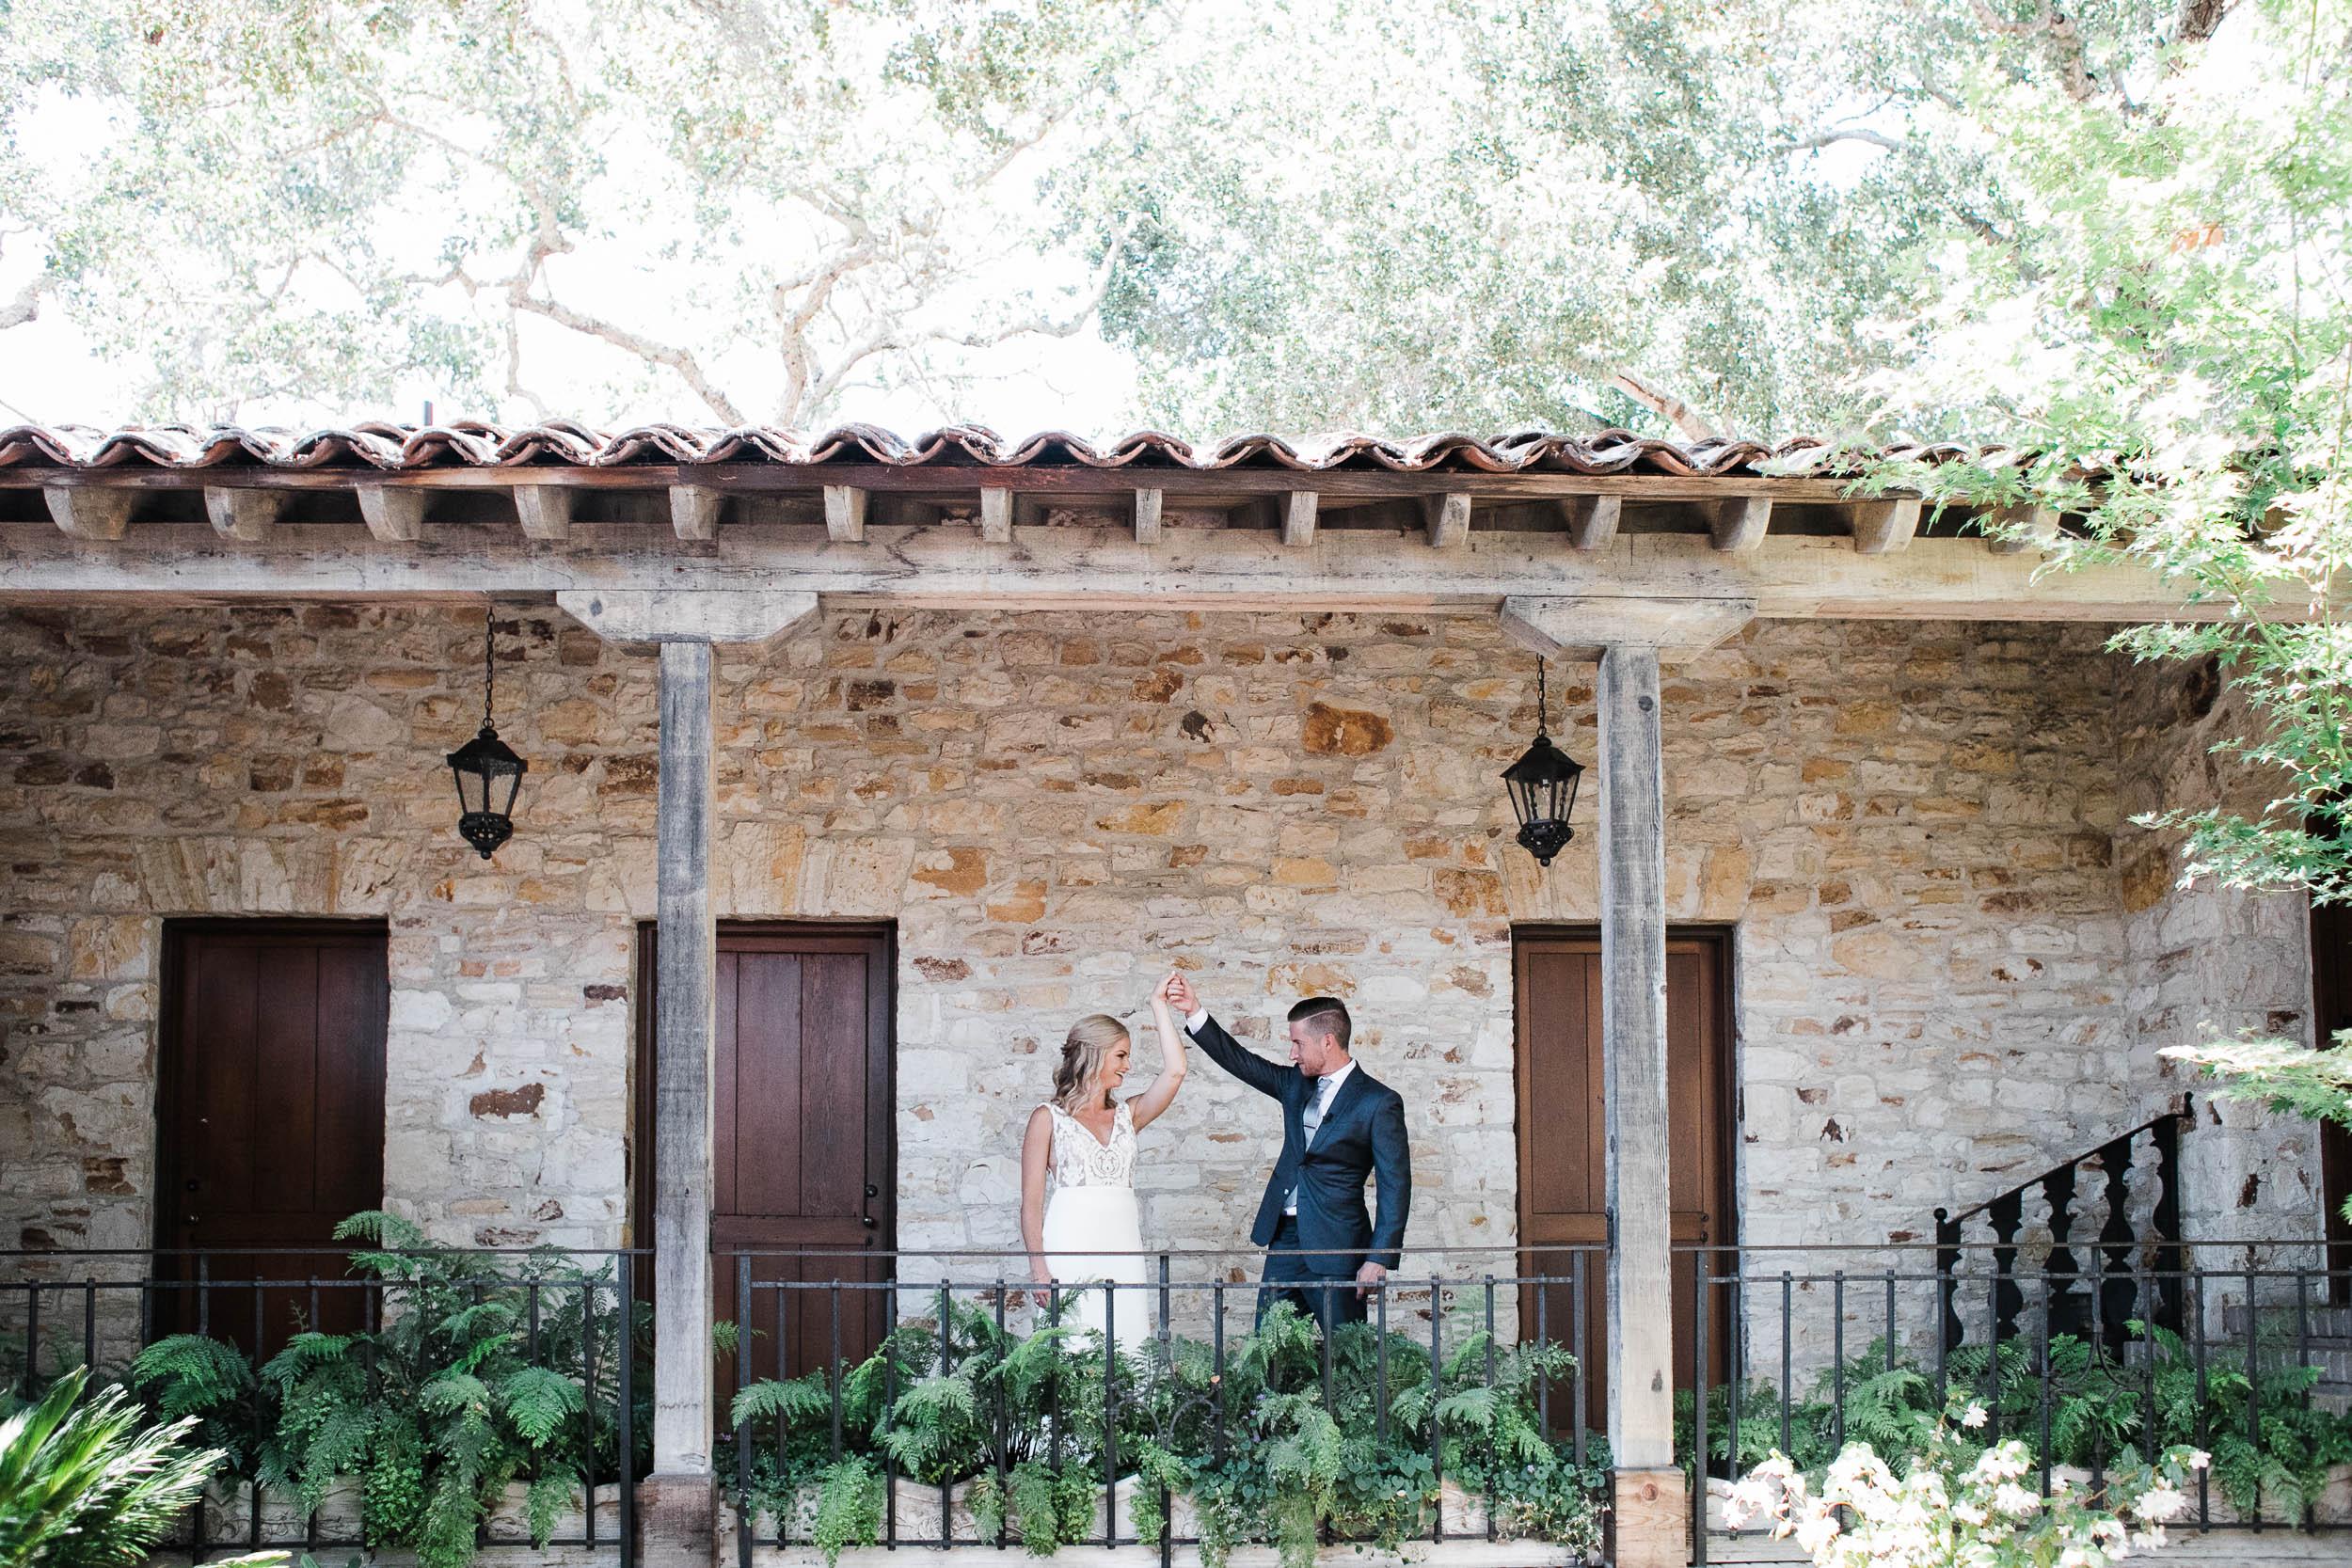 028_072118_D+K_Holman Ranch Wedding_Buena Lane Photography_0198ER copy.jpg